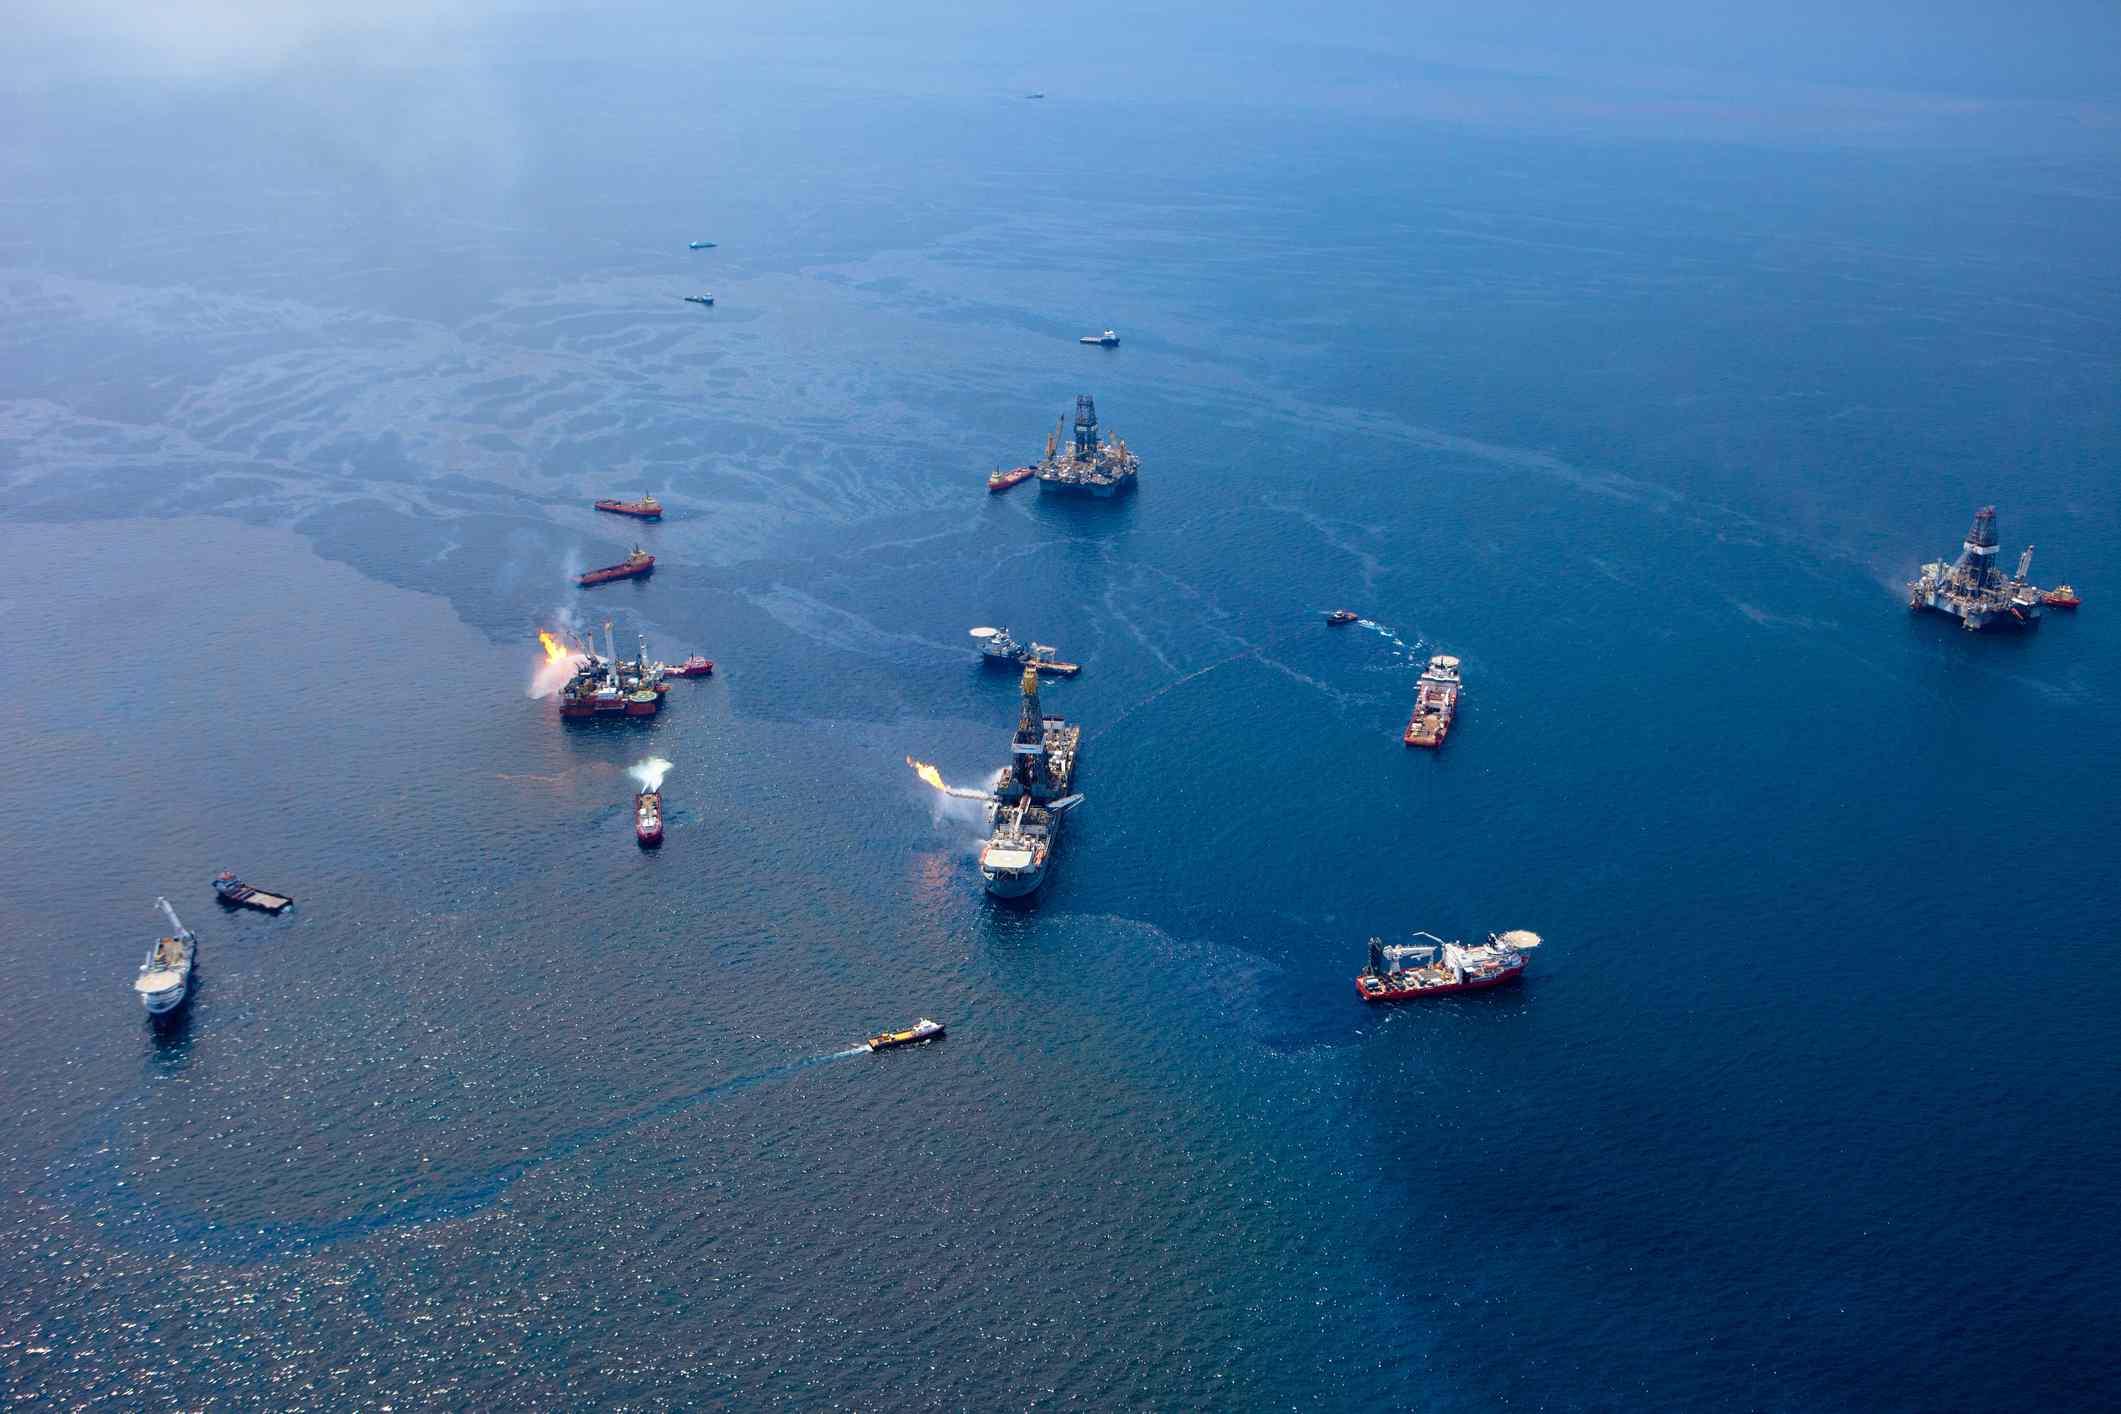 Overhead the Deepwater Horizon oil rig leak